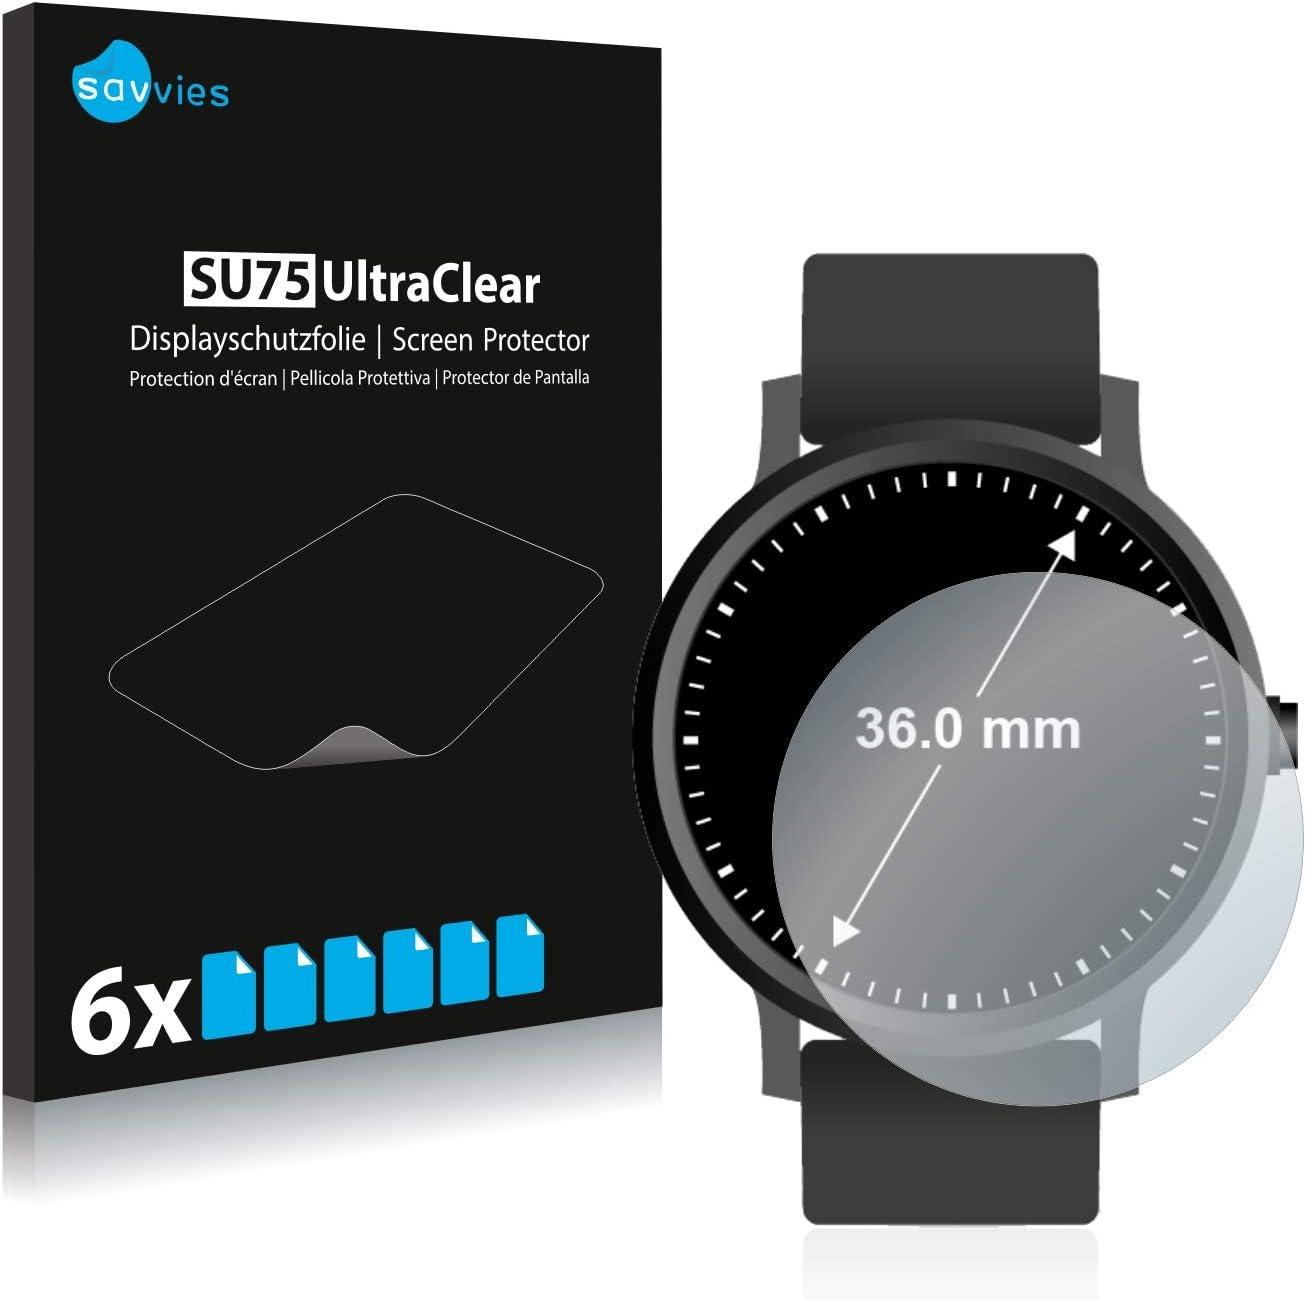 savvies Protector Pantalla Compatible con Relojes (Circular, Diámetro: 36 mm) (6 Unidades) Pelicula Ultra Transparente